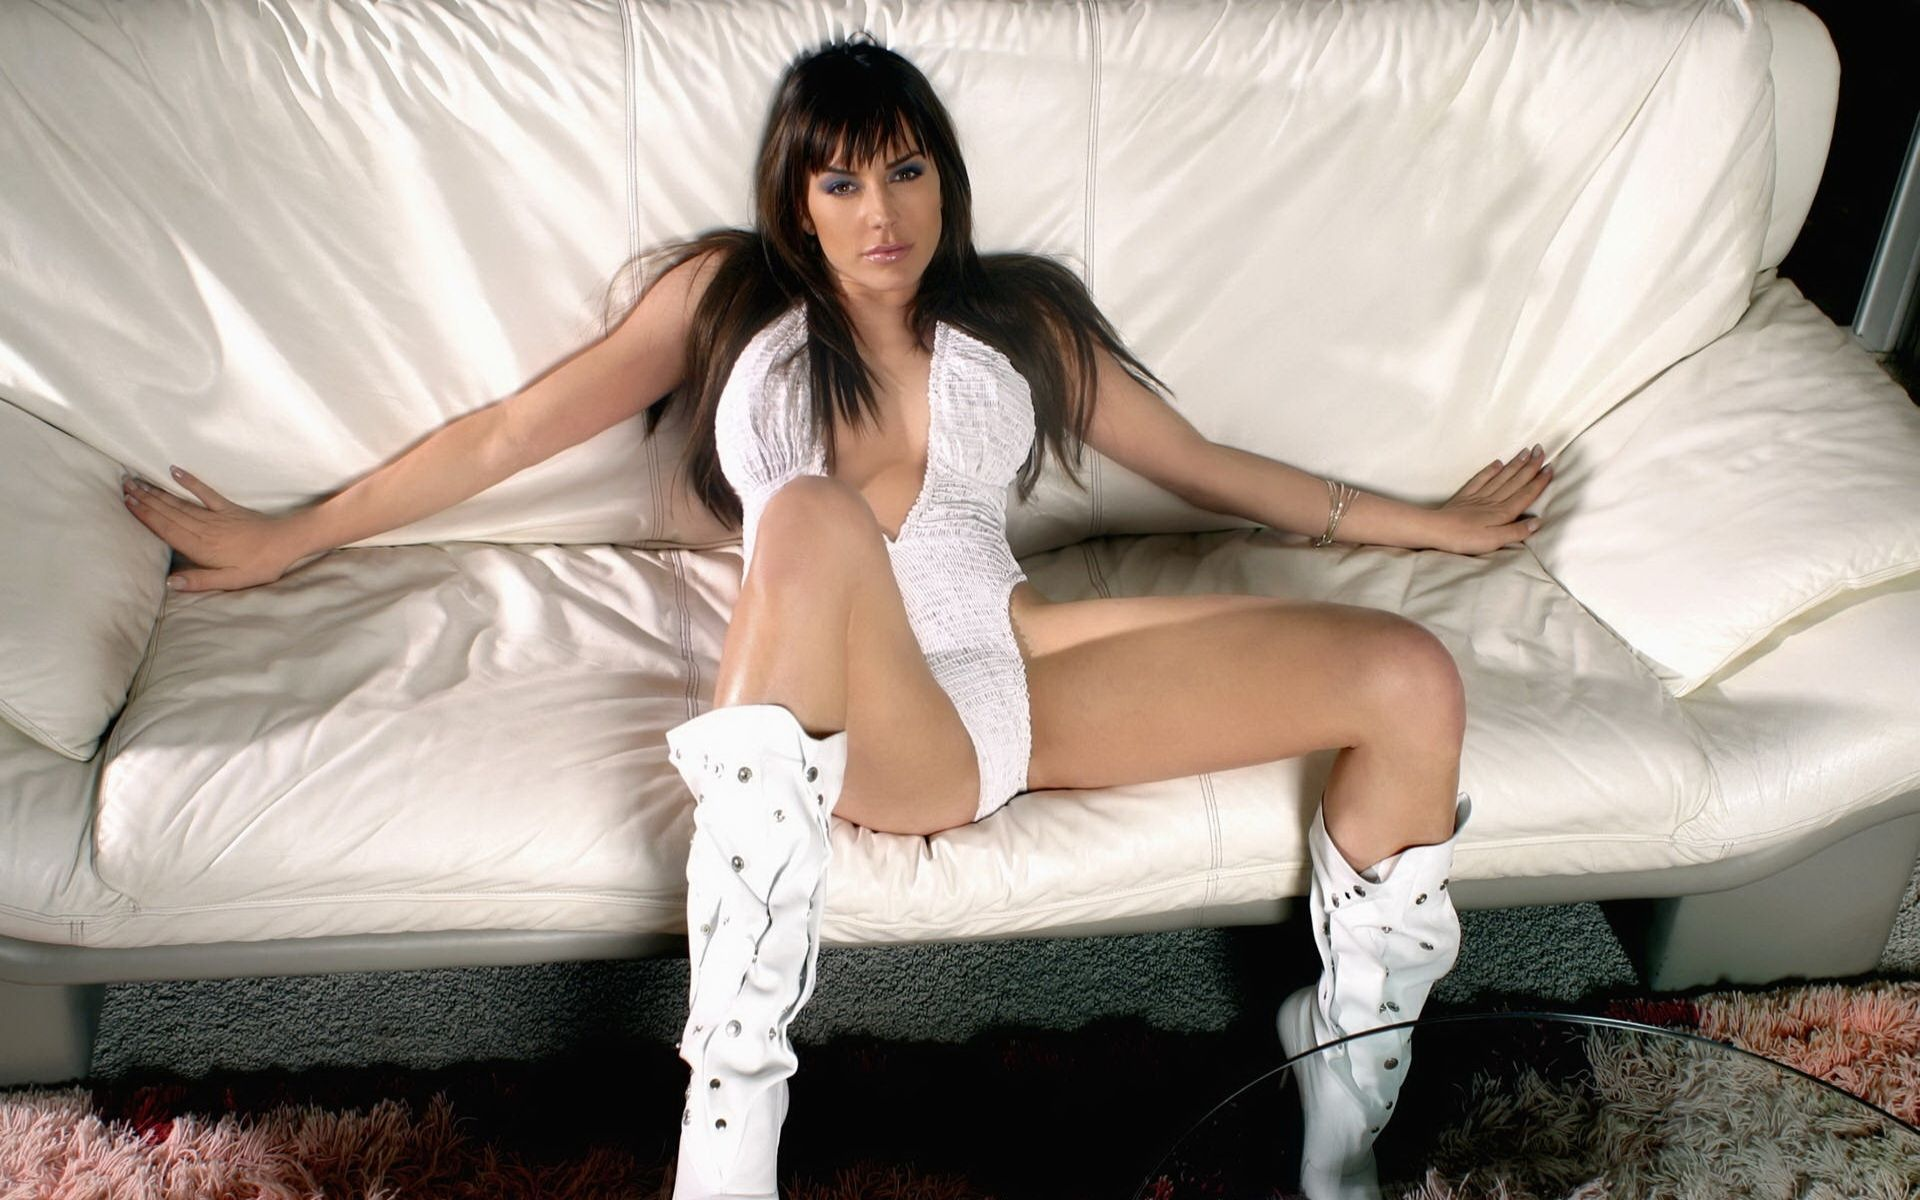 sex photo dounload. amateur. #sexy #sex #naked #nude #hot #girls